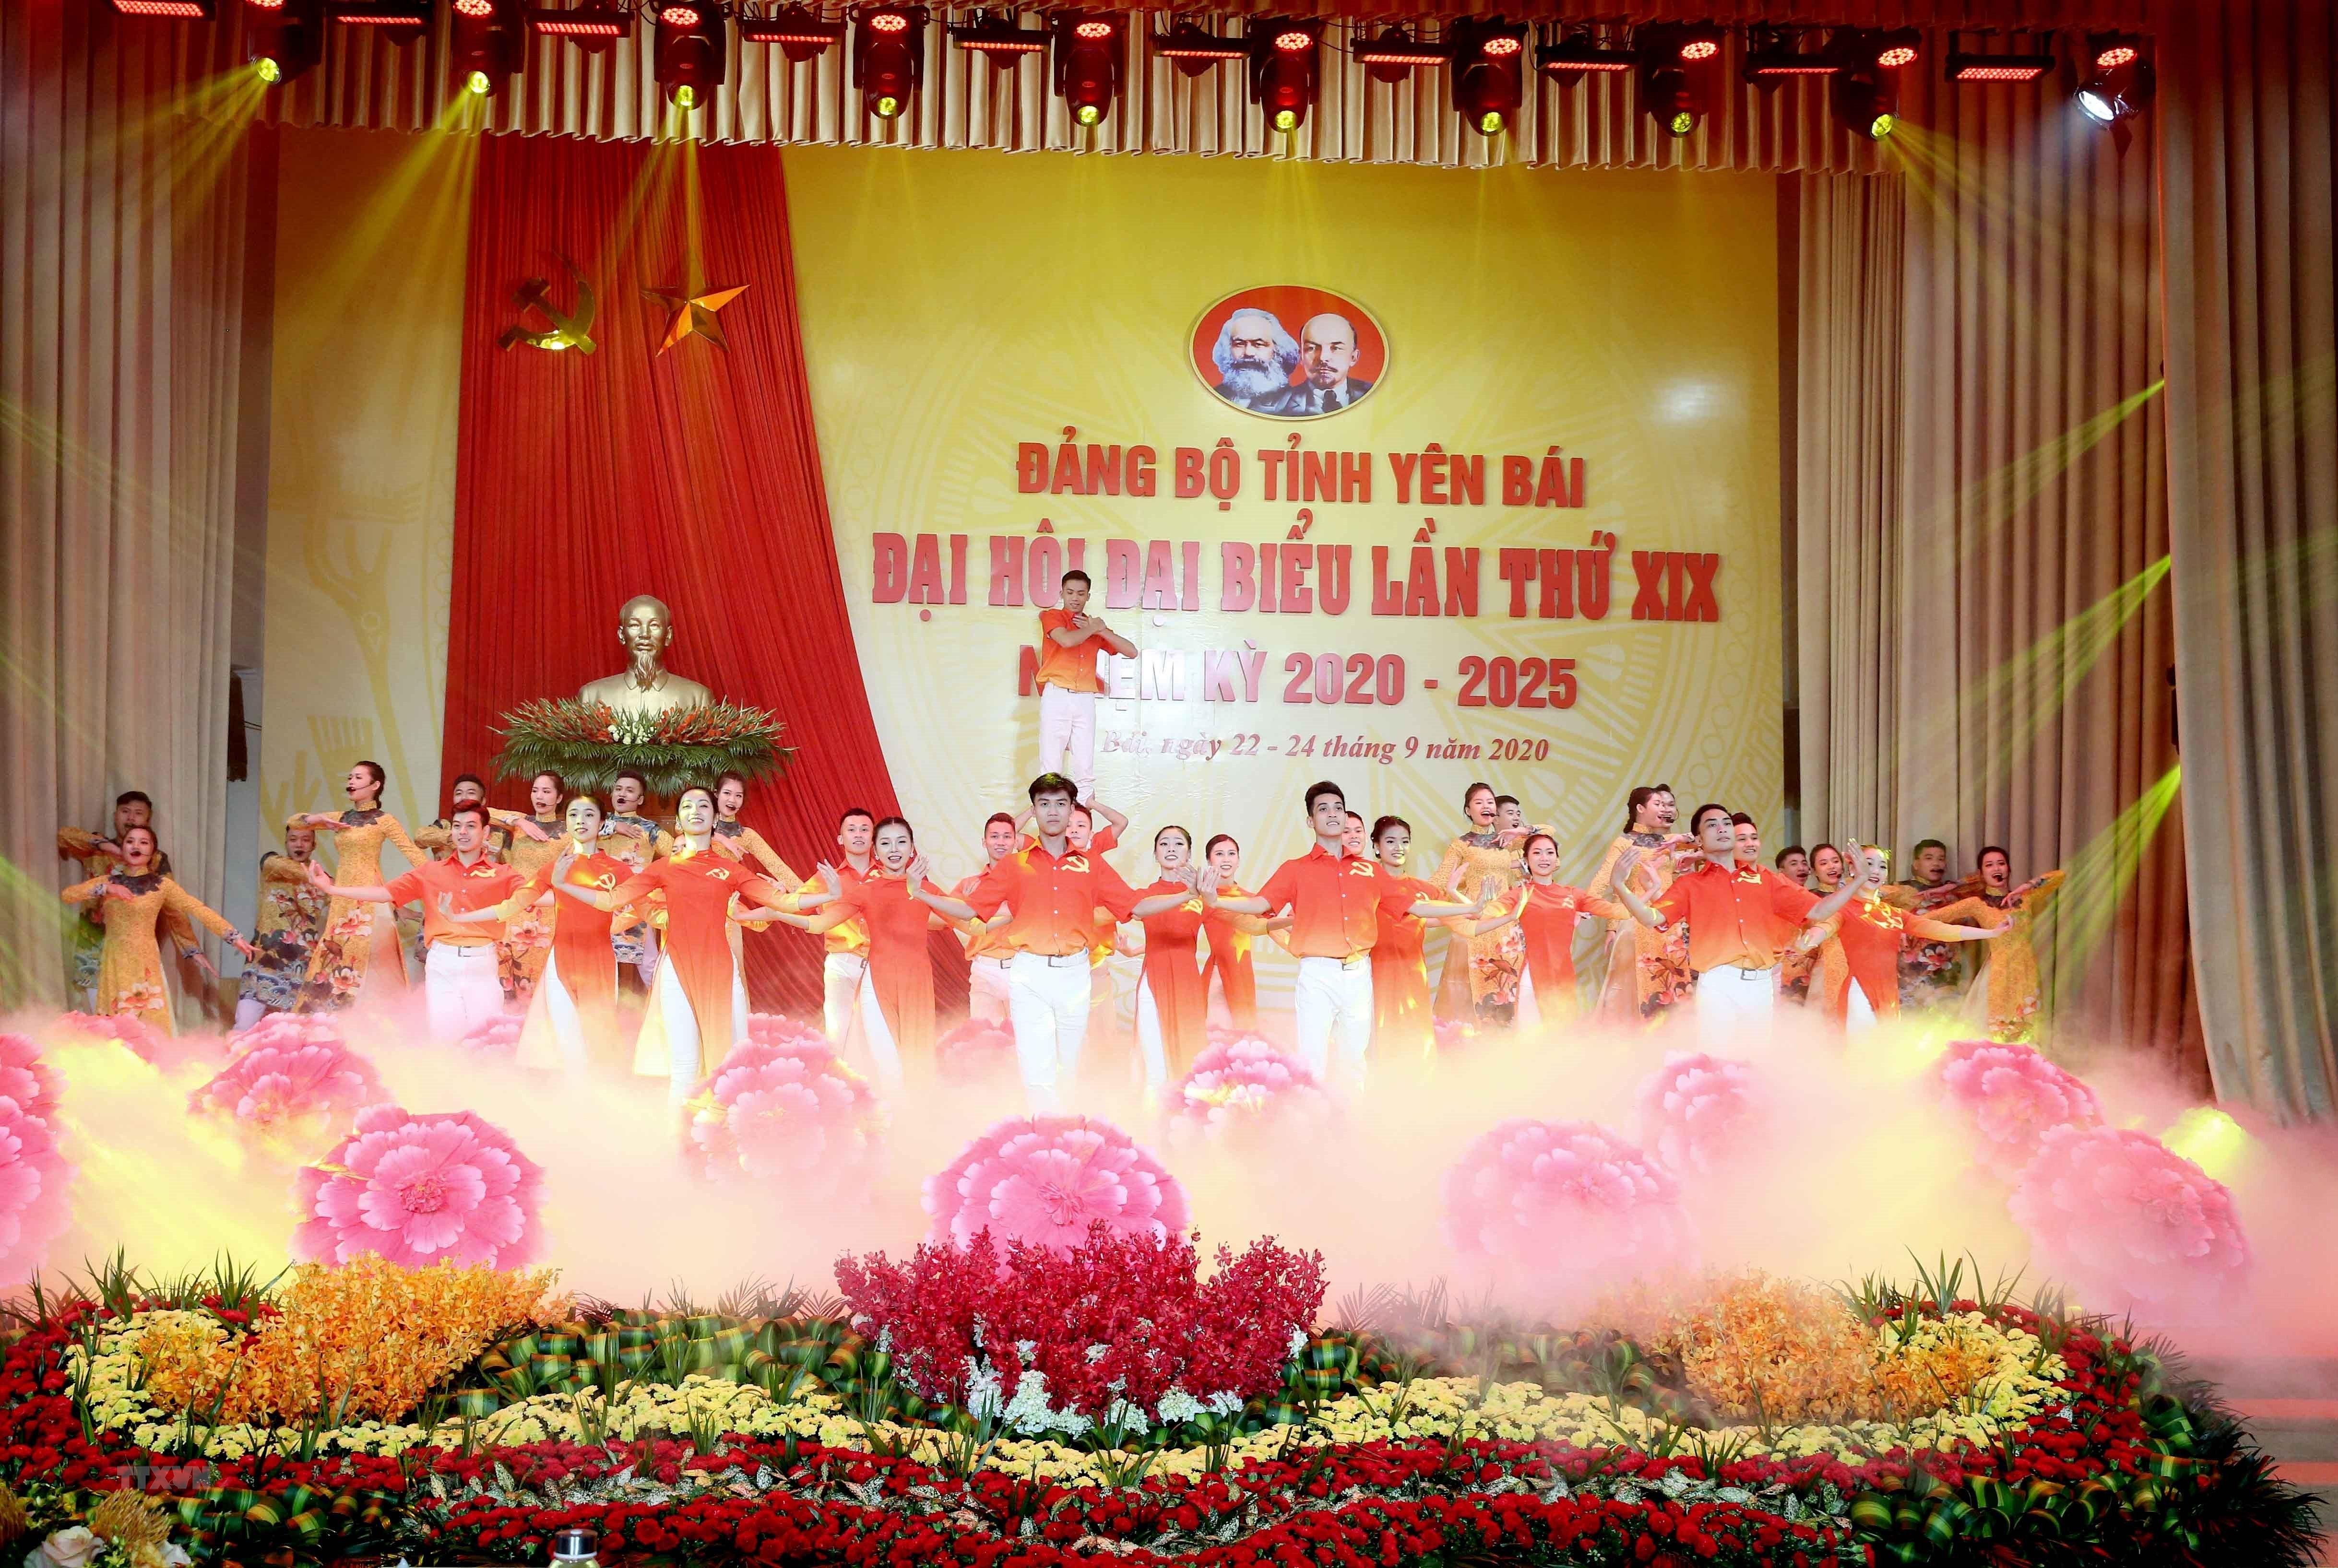 Hinh anh khai mac Dai hoi dai bieu Dang bo tinh Yen Bai lan thu XIX hinh anh 1